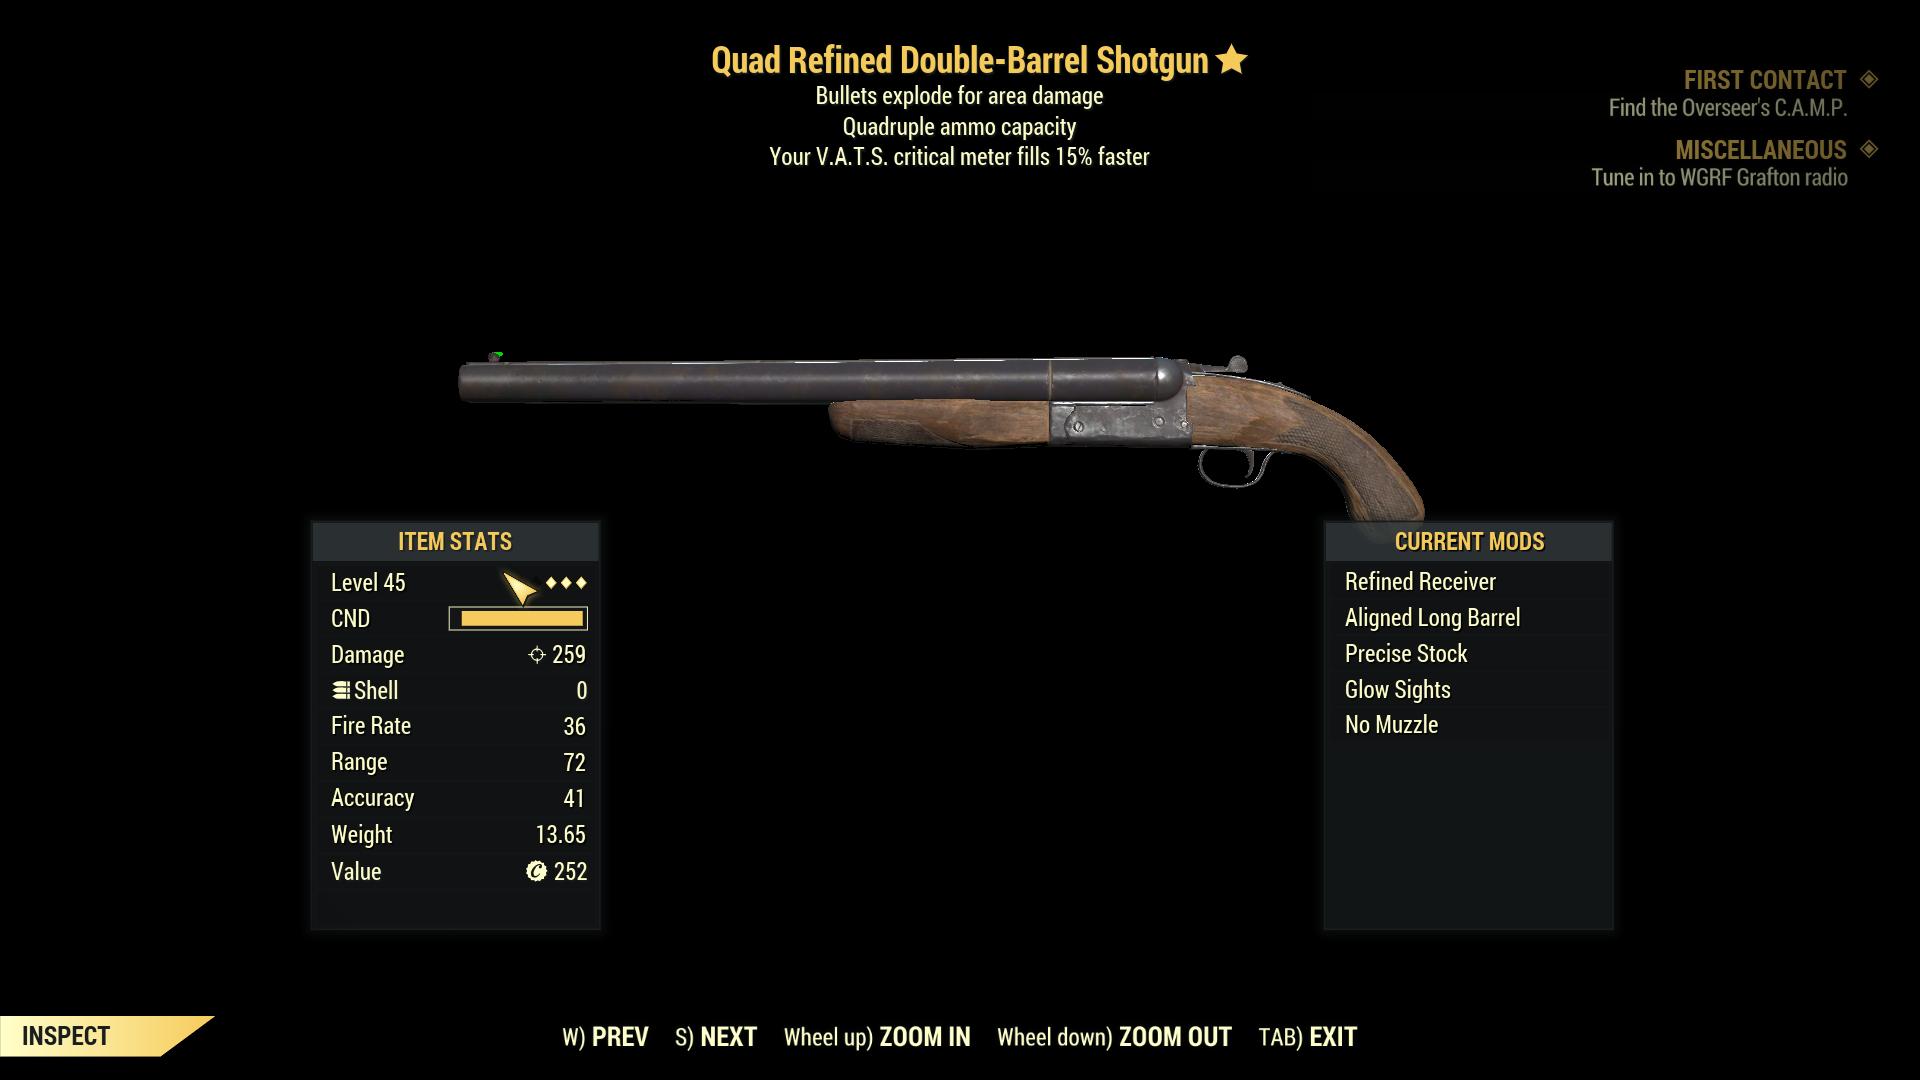 ★★★ Quad Explosive Double Barrel Shotgun[VATS Critical 15%] | FULLY MODIFIED | FAST DELIVERY |